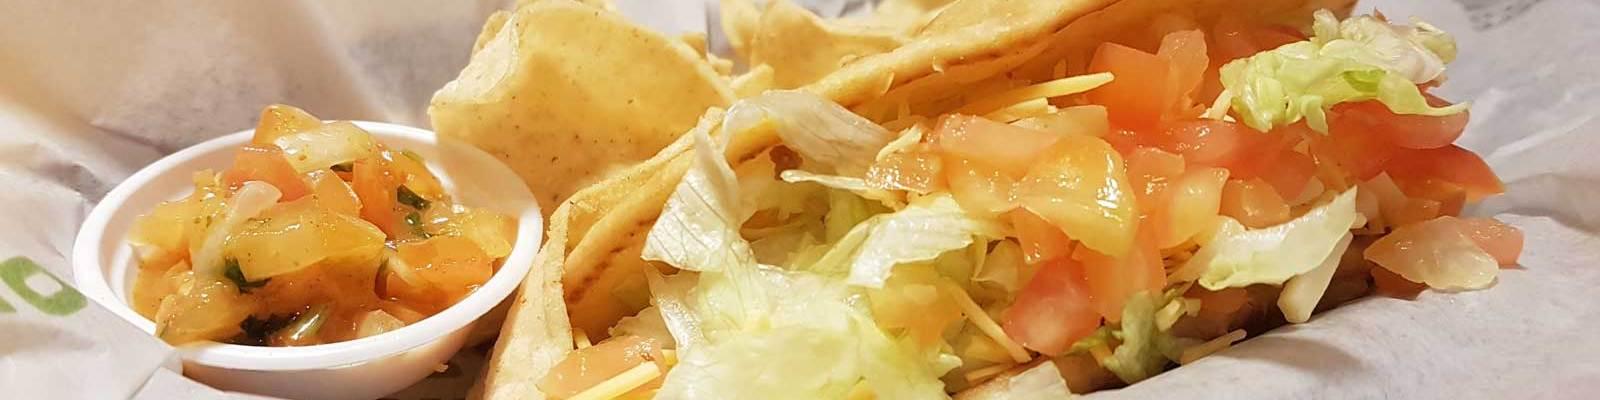 Taco Bell's Chalupa Supreme